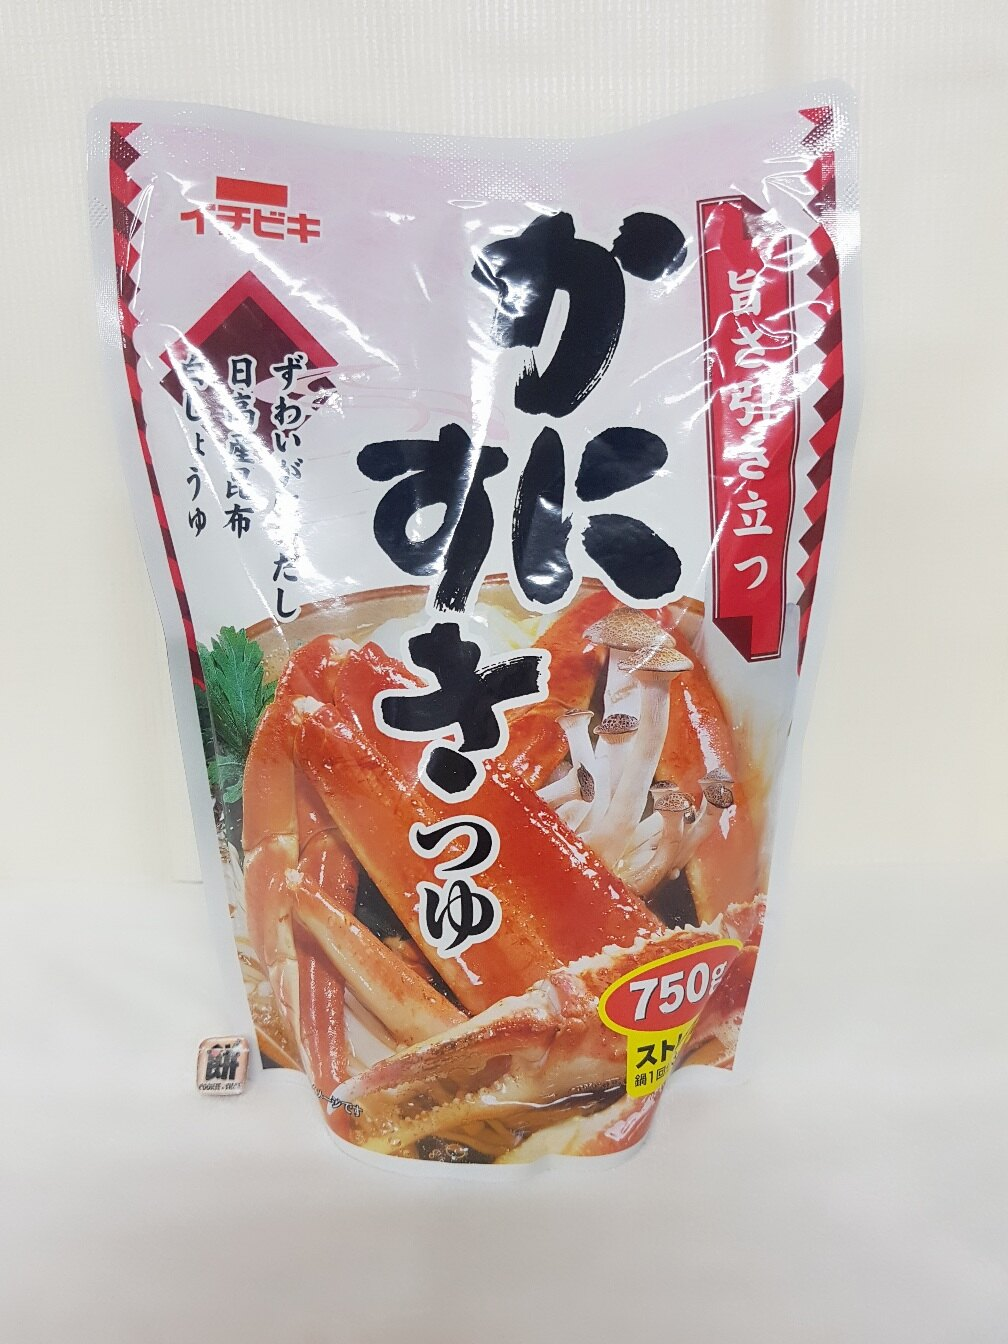 Ichibiki 螃蟹火鍋湯底-750ml包